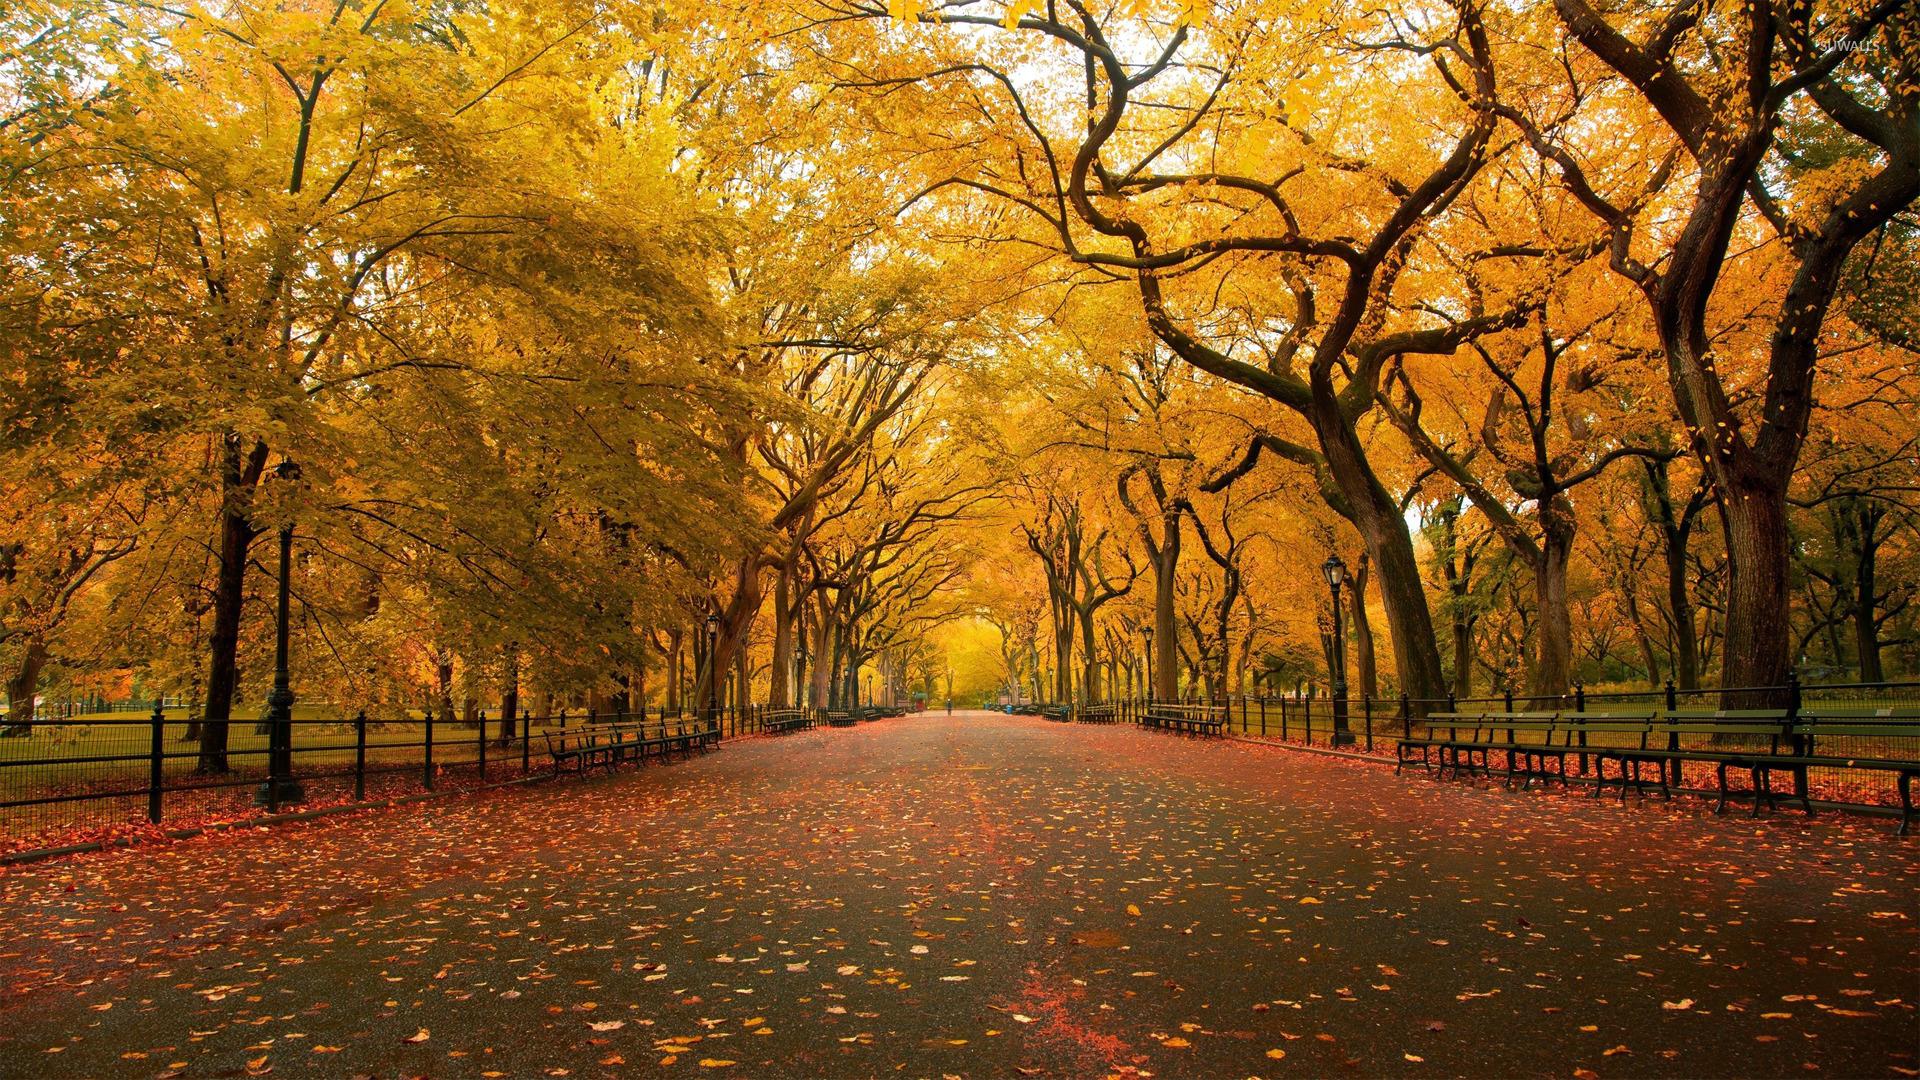 Central Park Fall Desktop Wallpaper Autumn In The Park Wallpaper Nature Wallpapers 15609